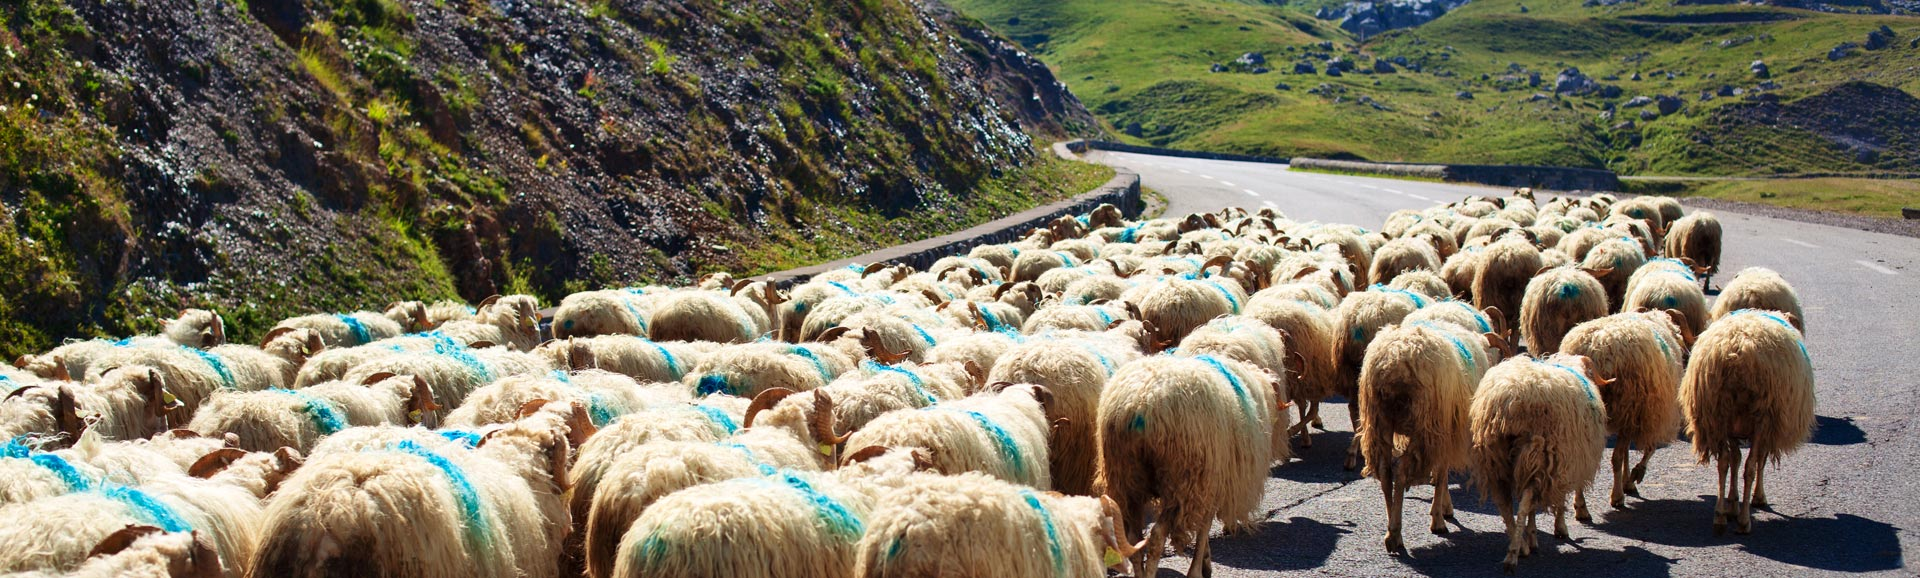 Berühmte Szenerie in Irland - damit muss man rechnen.